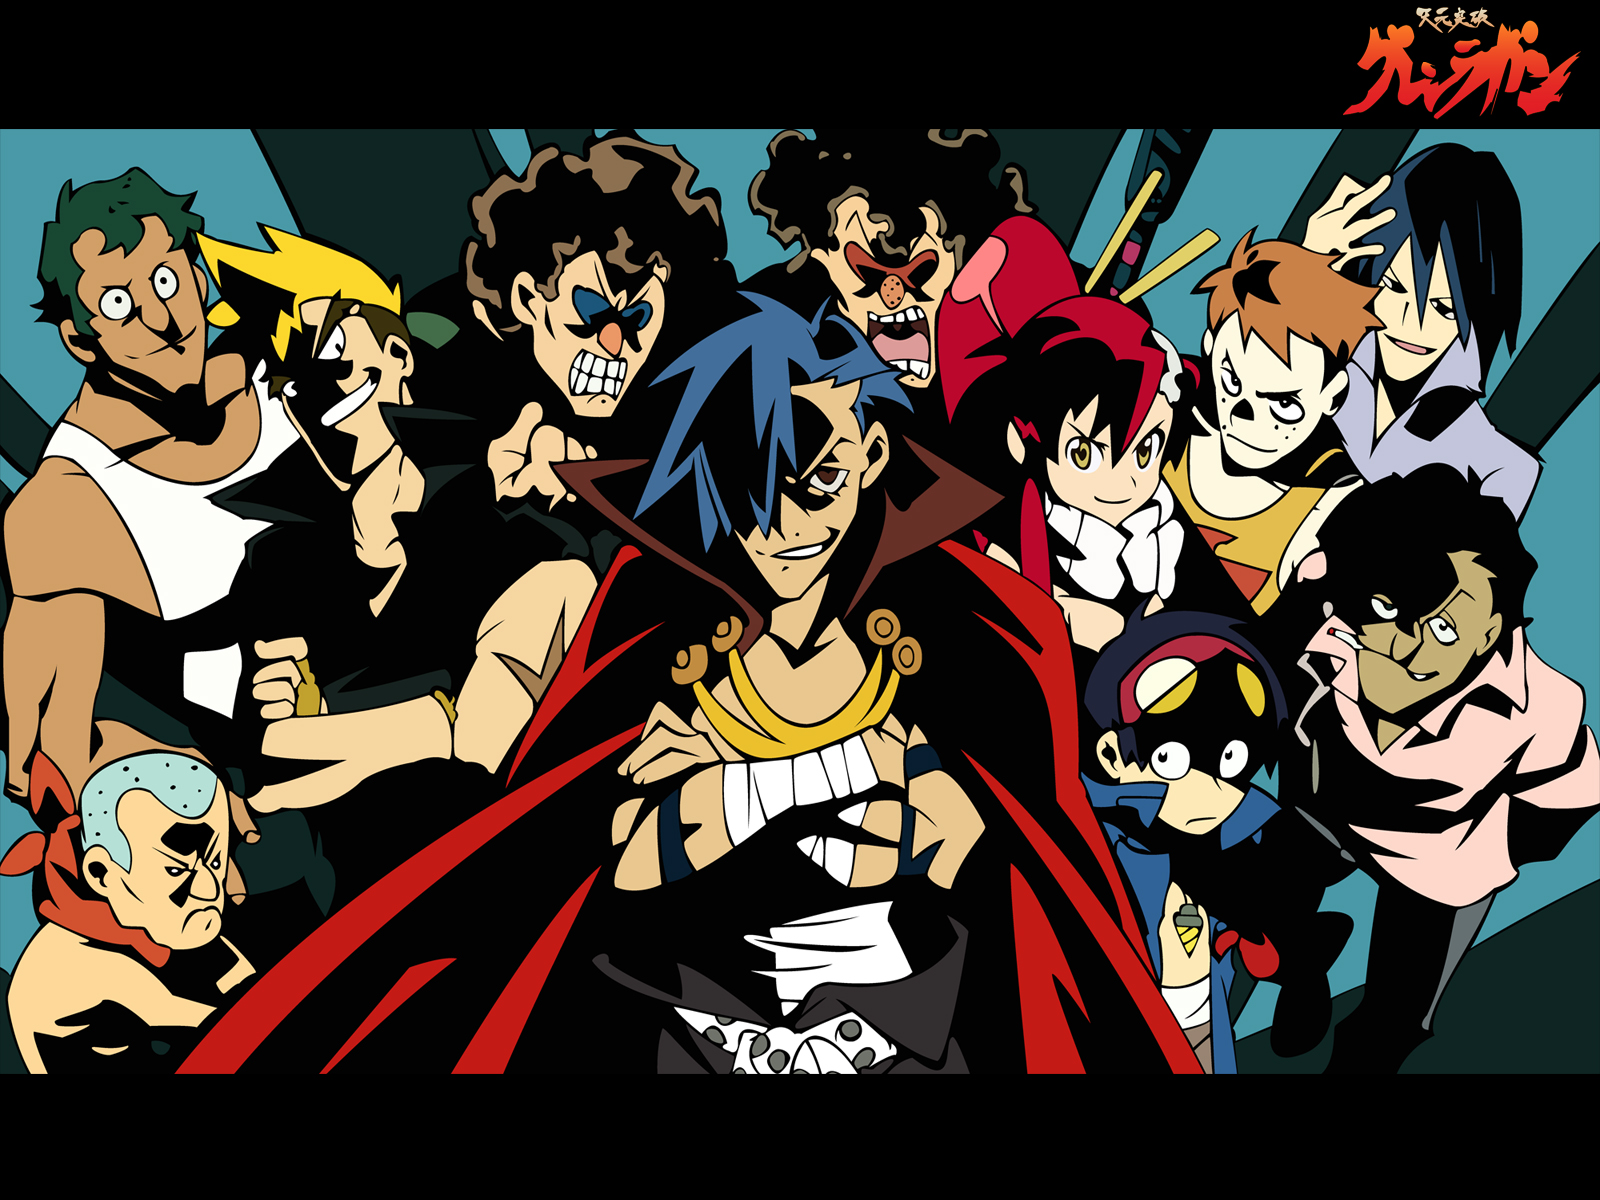 ¿ Quienes me Recomiandan algun Anime Futurista ?